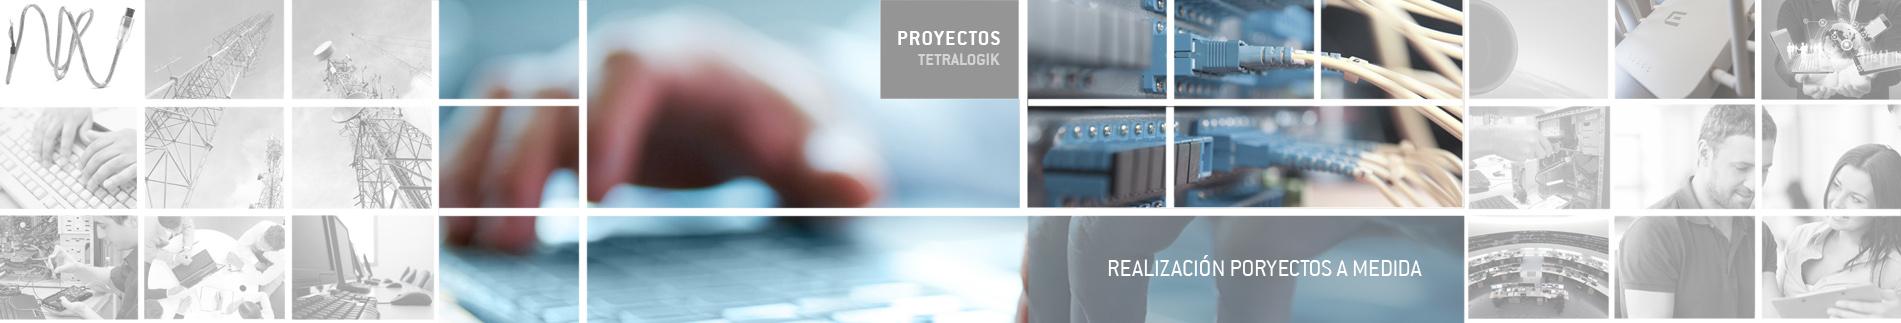 Tetralogik proyectos a medida